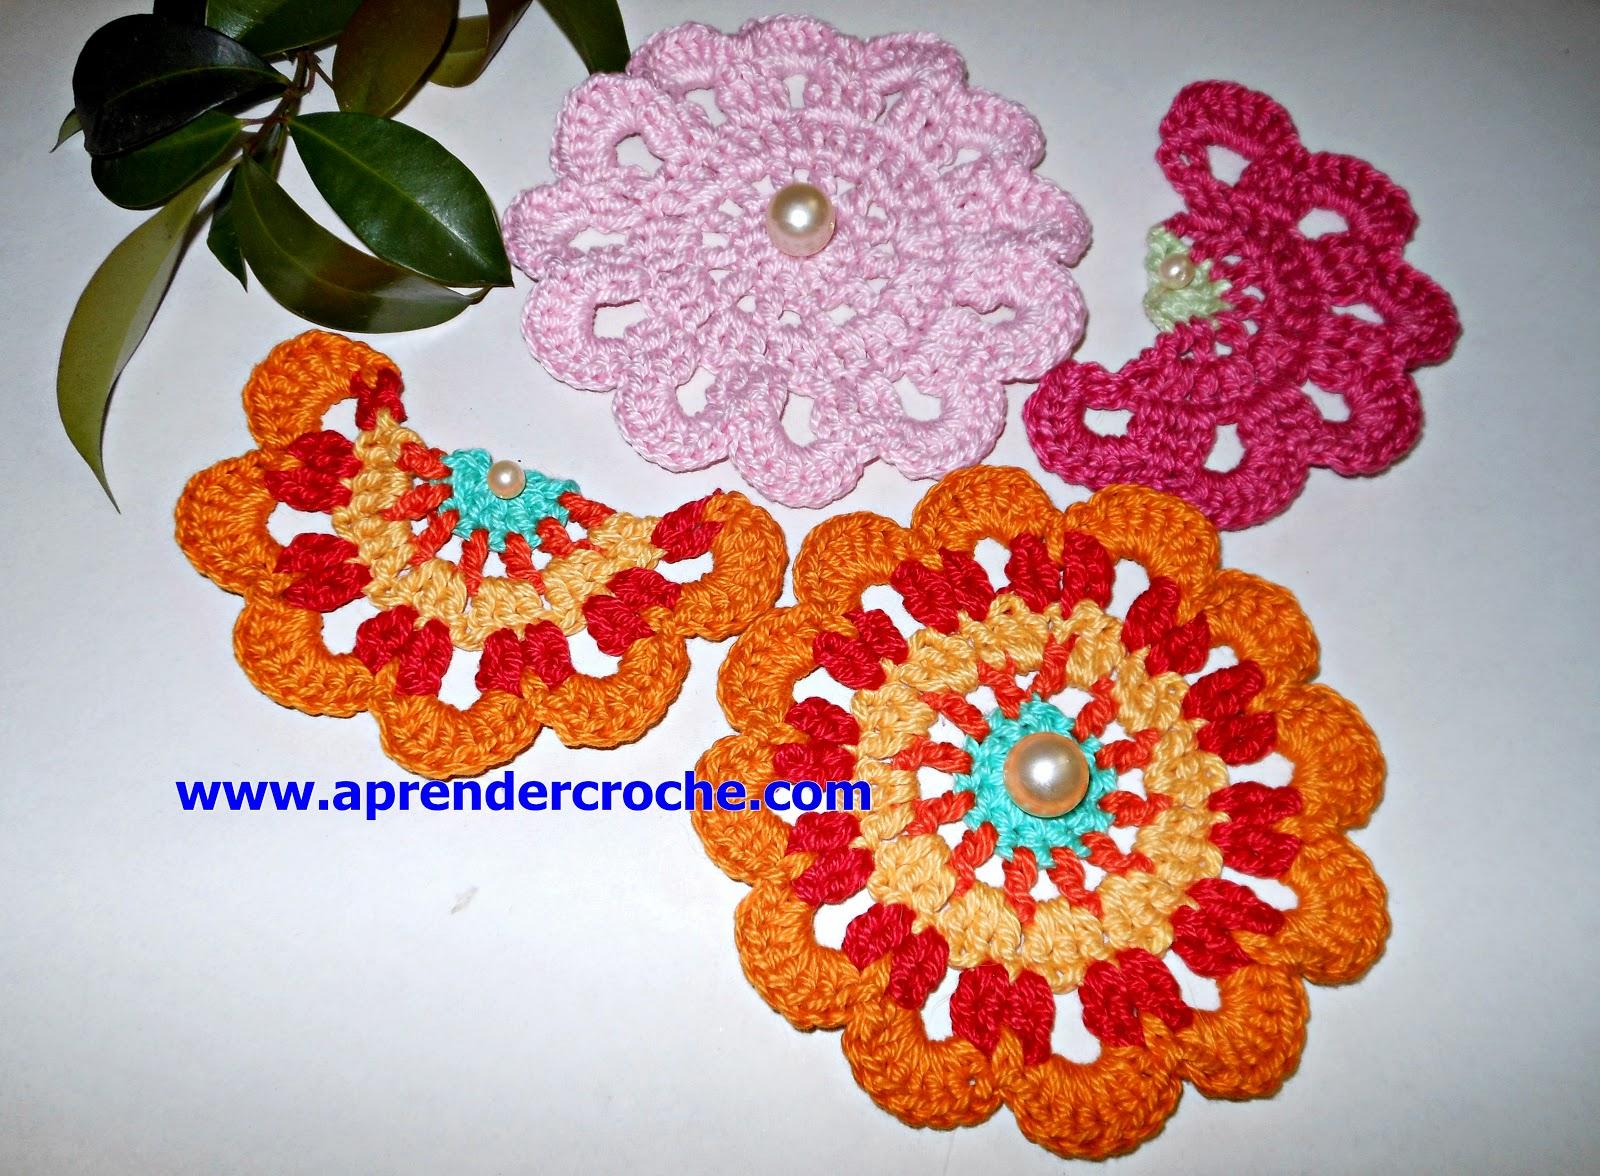 dvd flores em croche 5 volumes flores Kwan China loja curso frete gratis